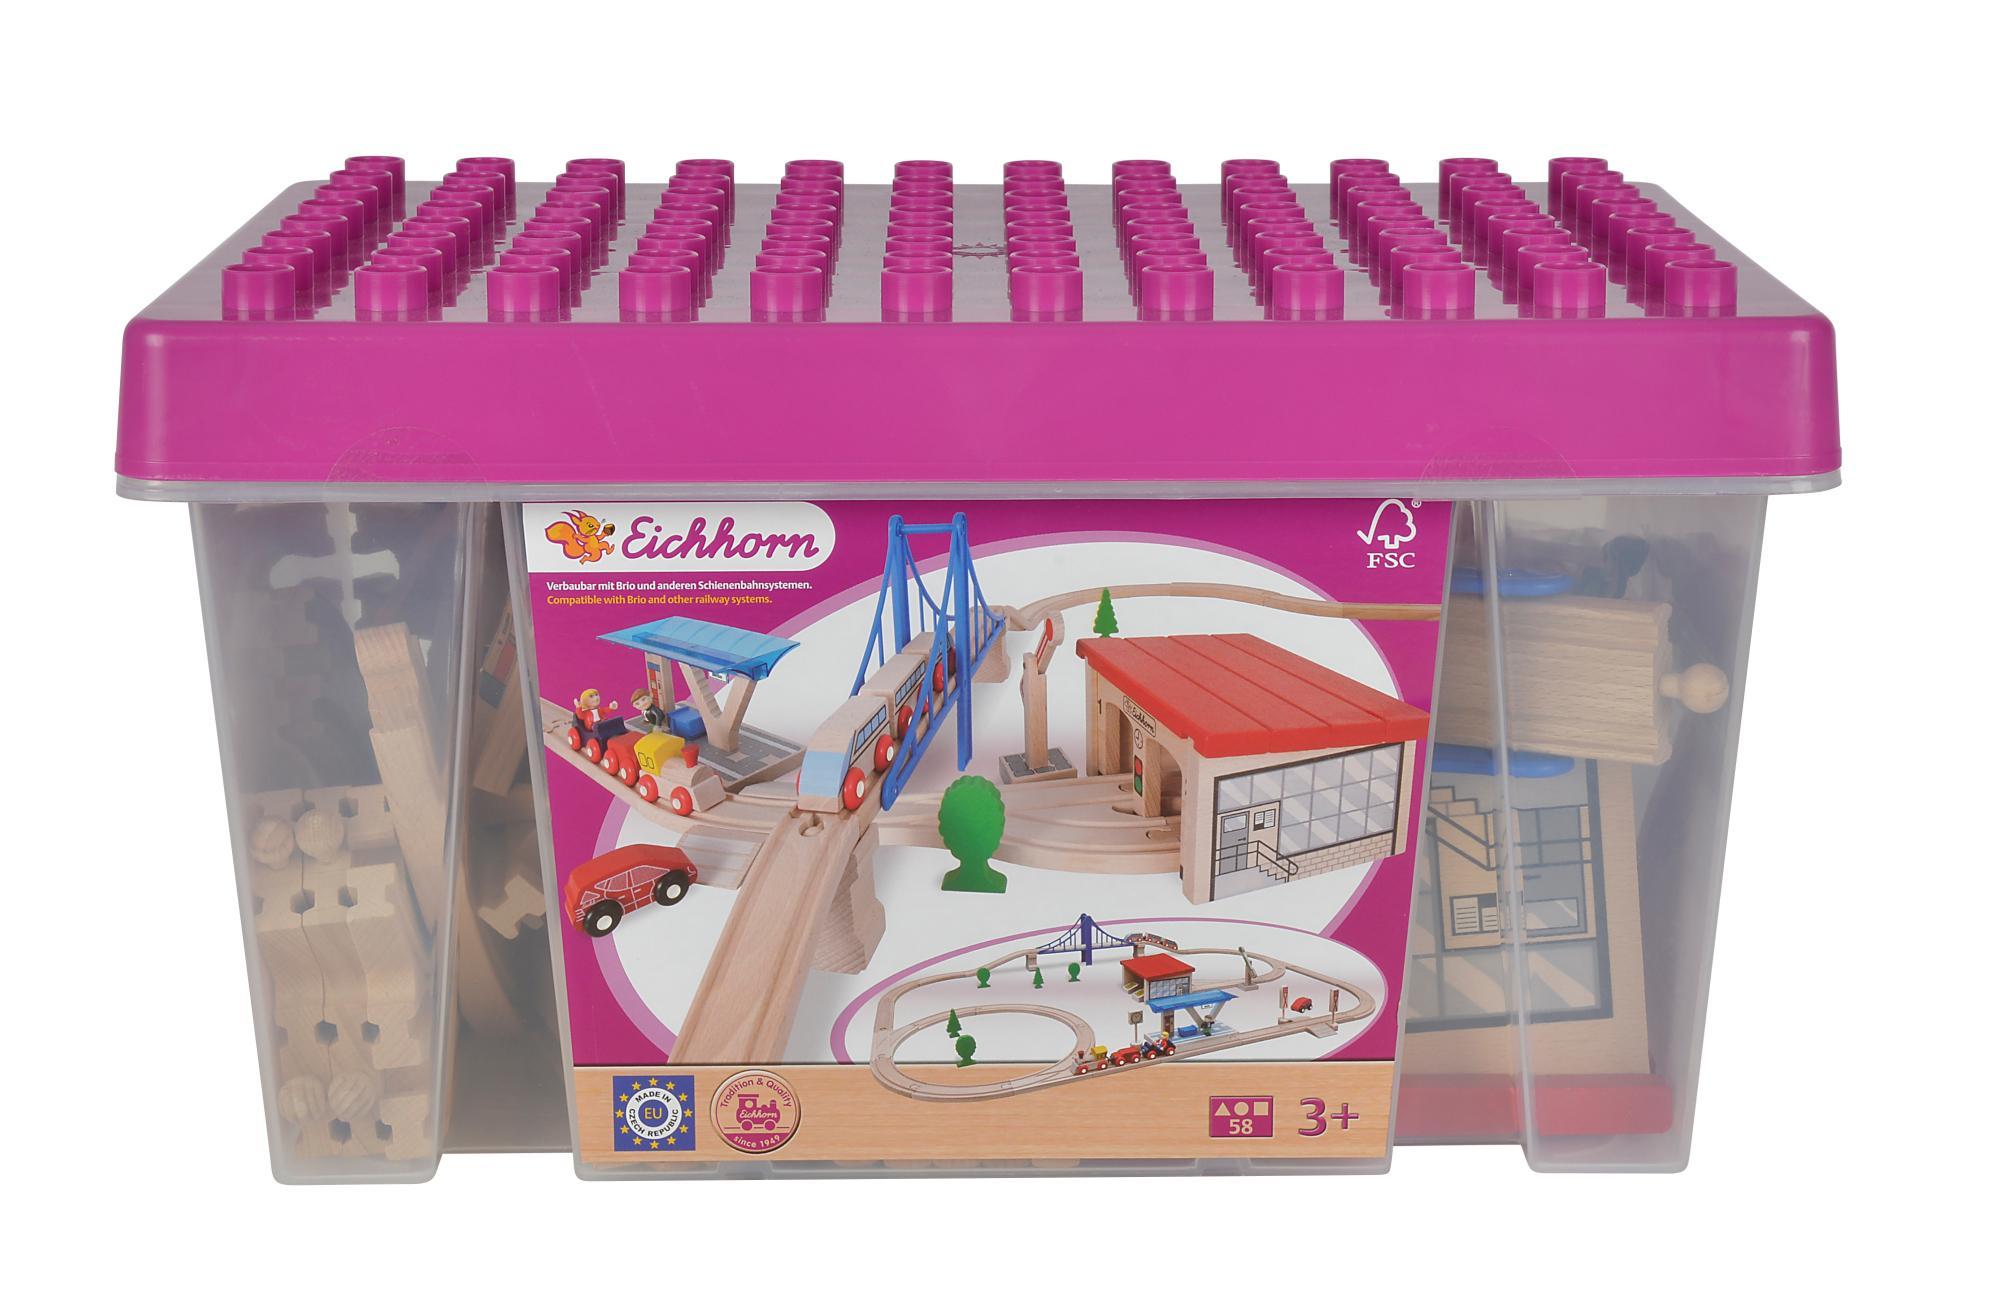 Simba Eichhorn 100001228 - Großes Bahnset in Box, 58